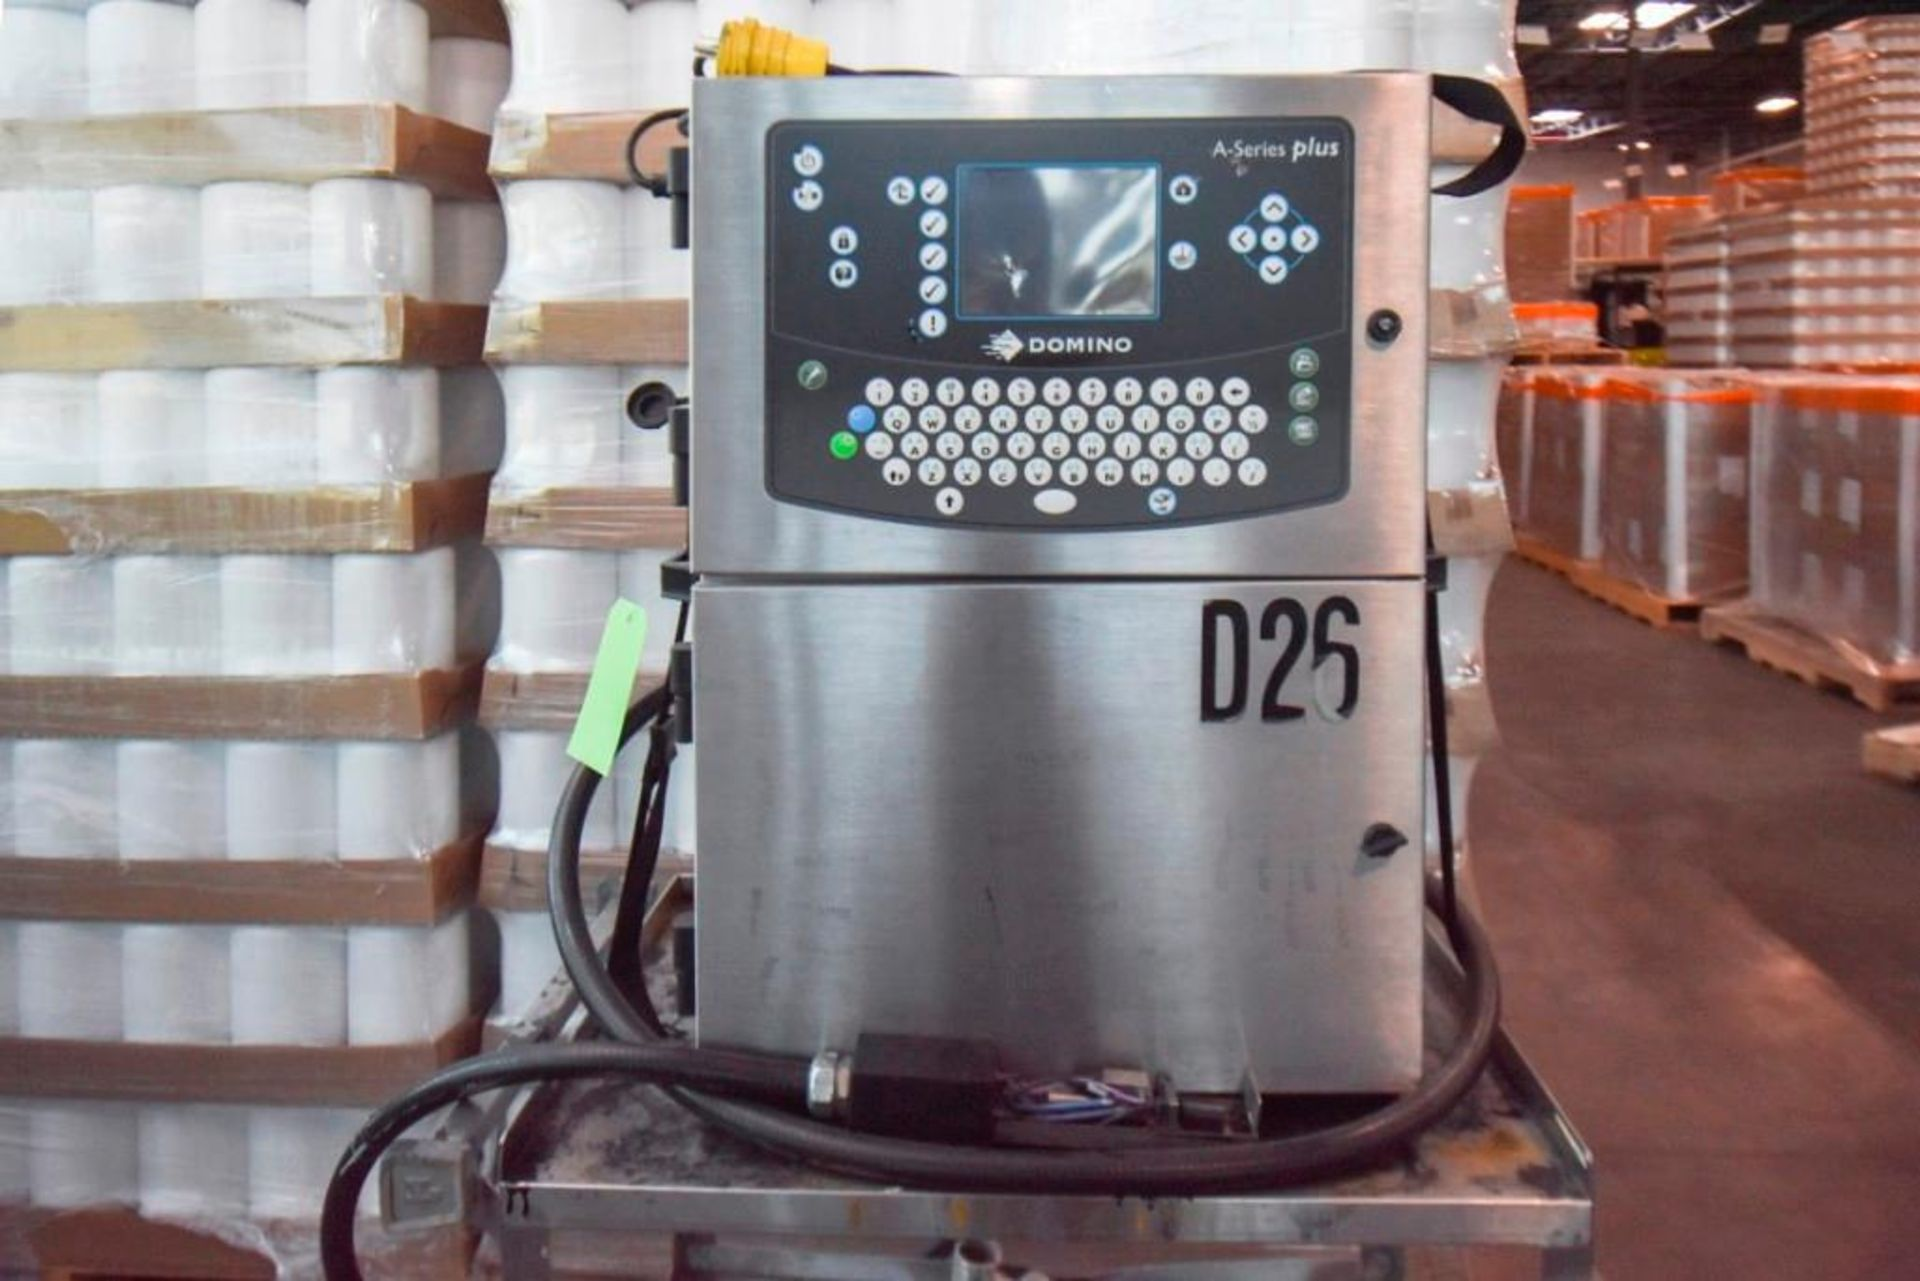 Domino A100+ Printer - Image 2 of 9